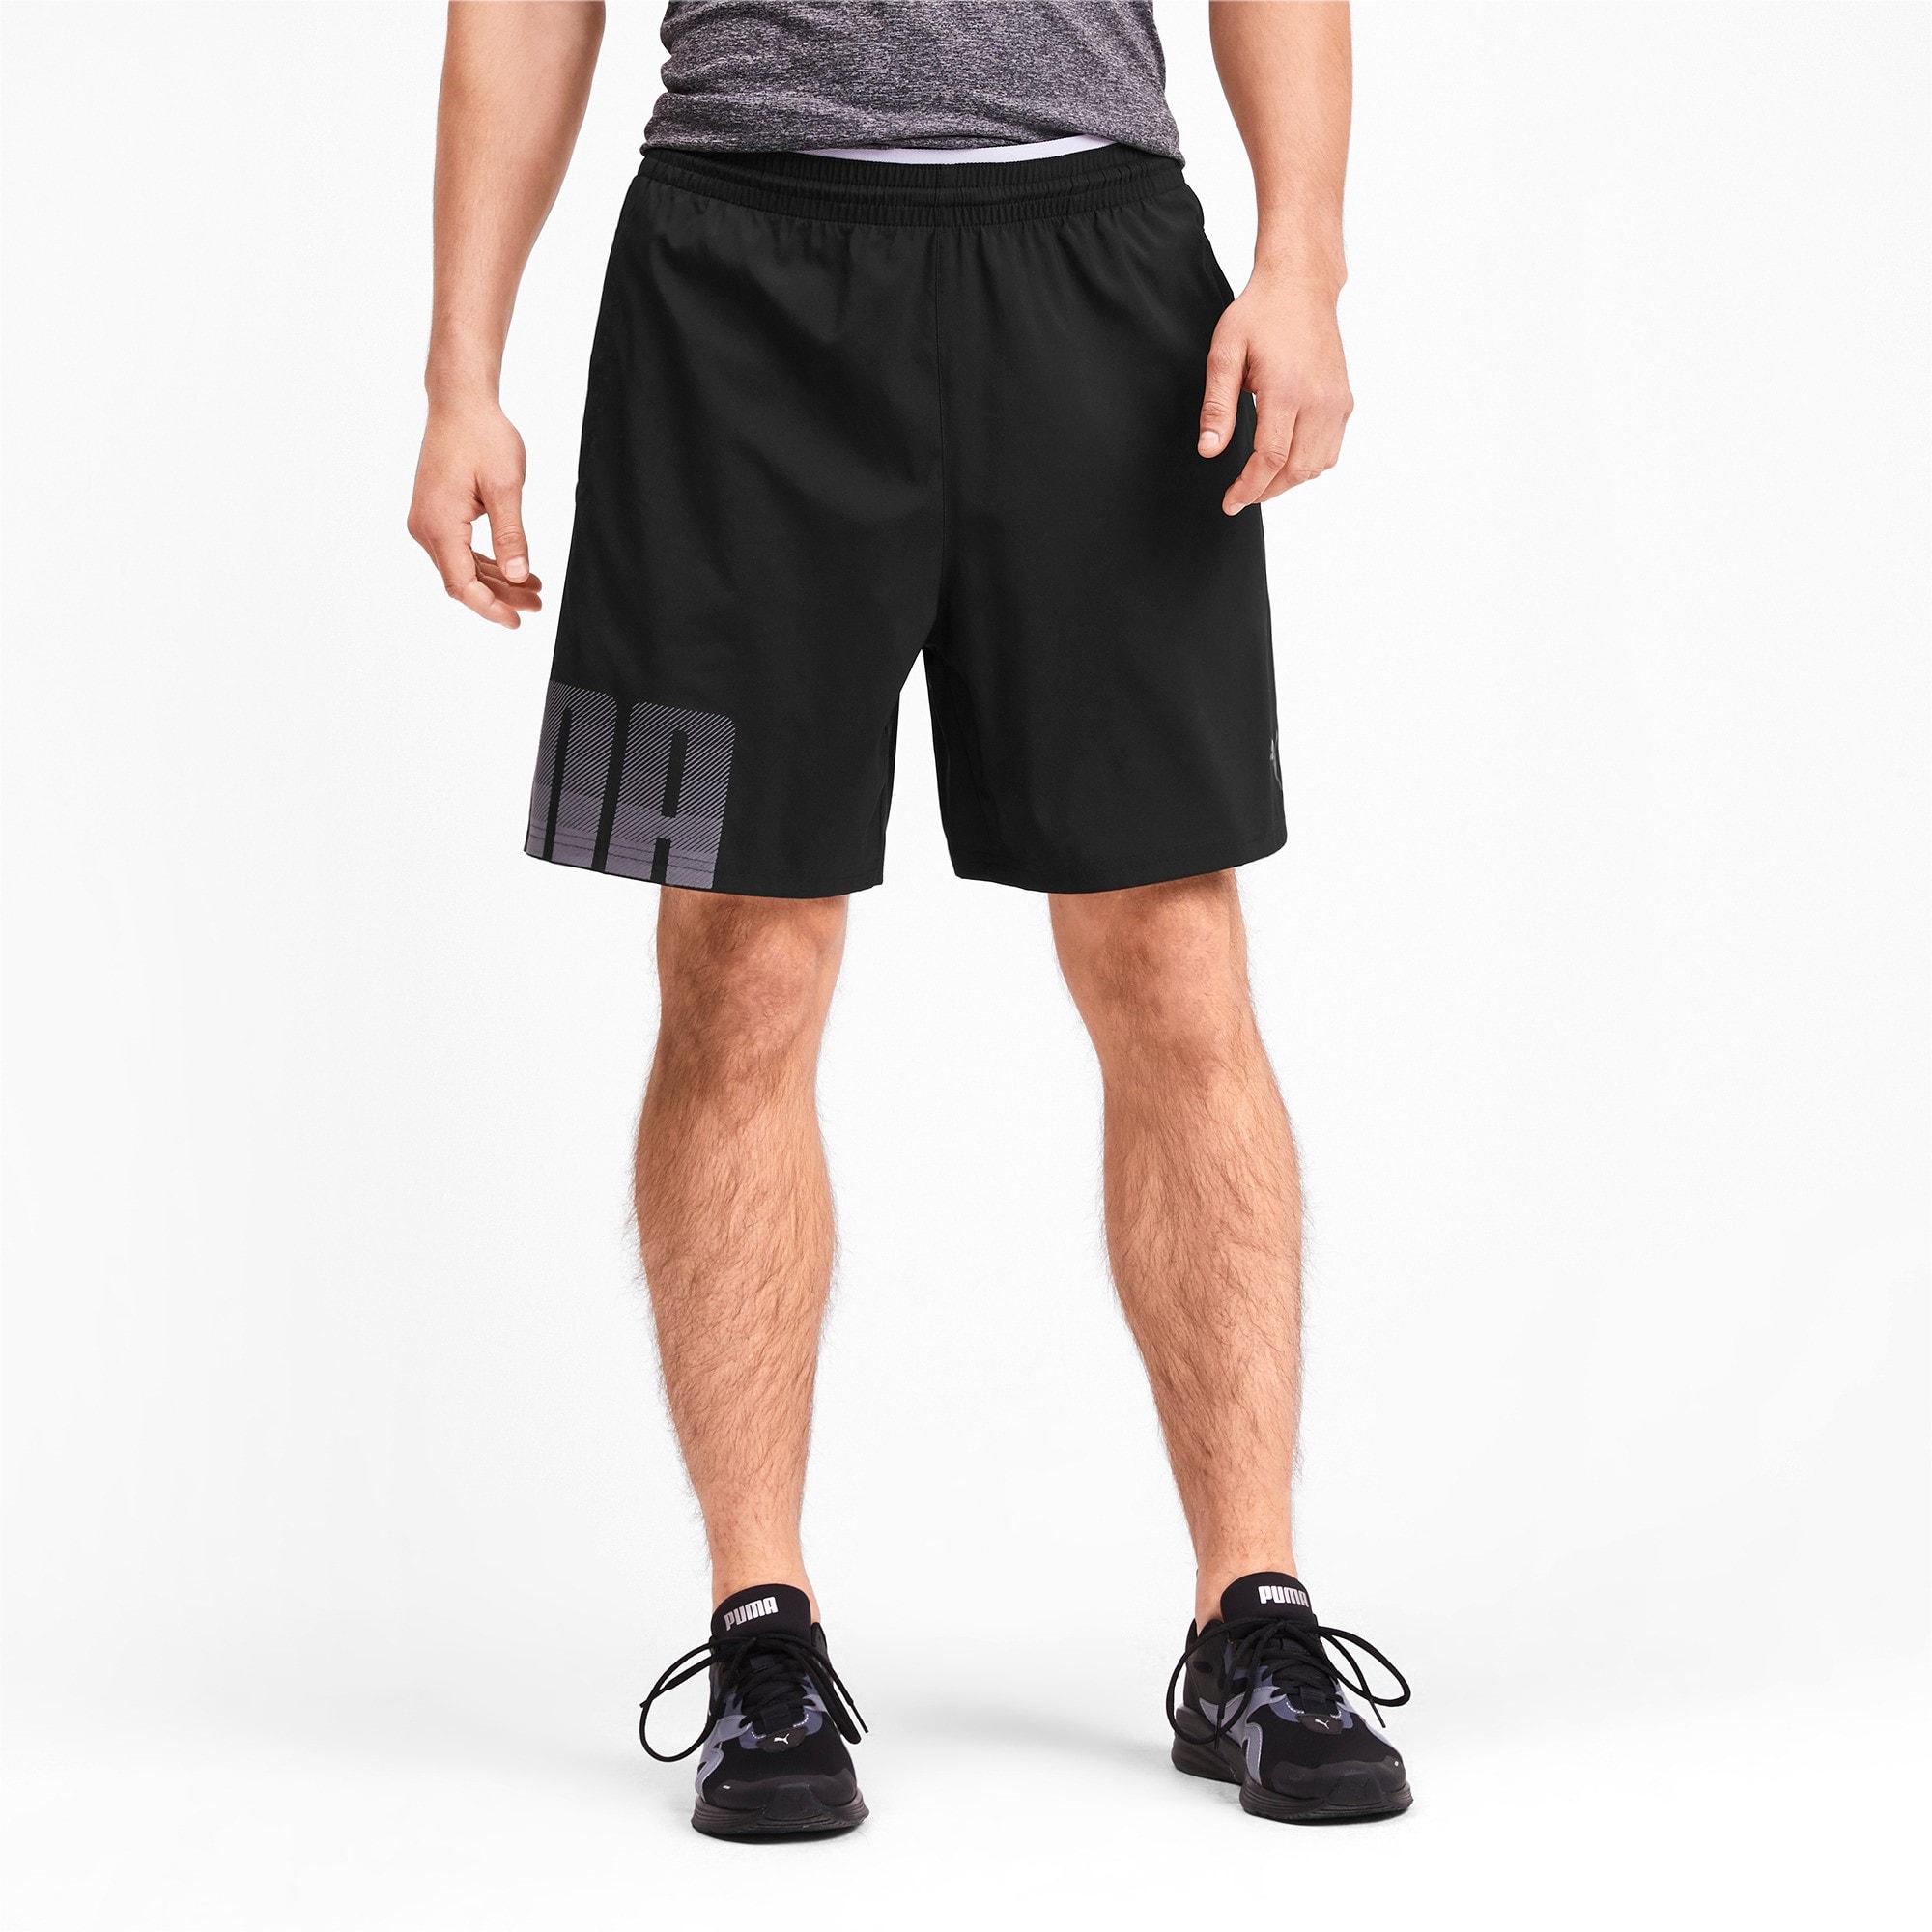 Miniatura 1 de Shorts de punto Collective para hombre, Puma Black, mediano